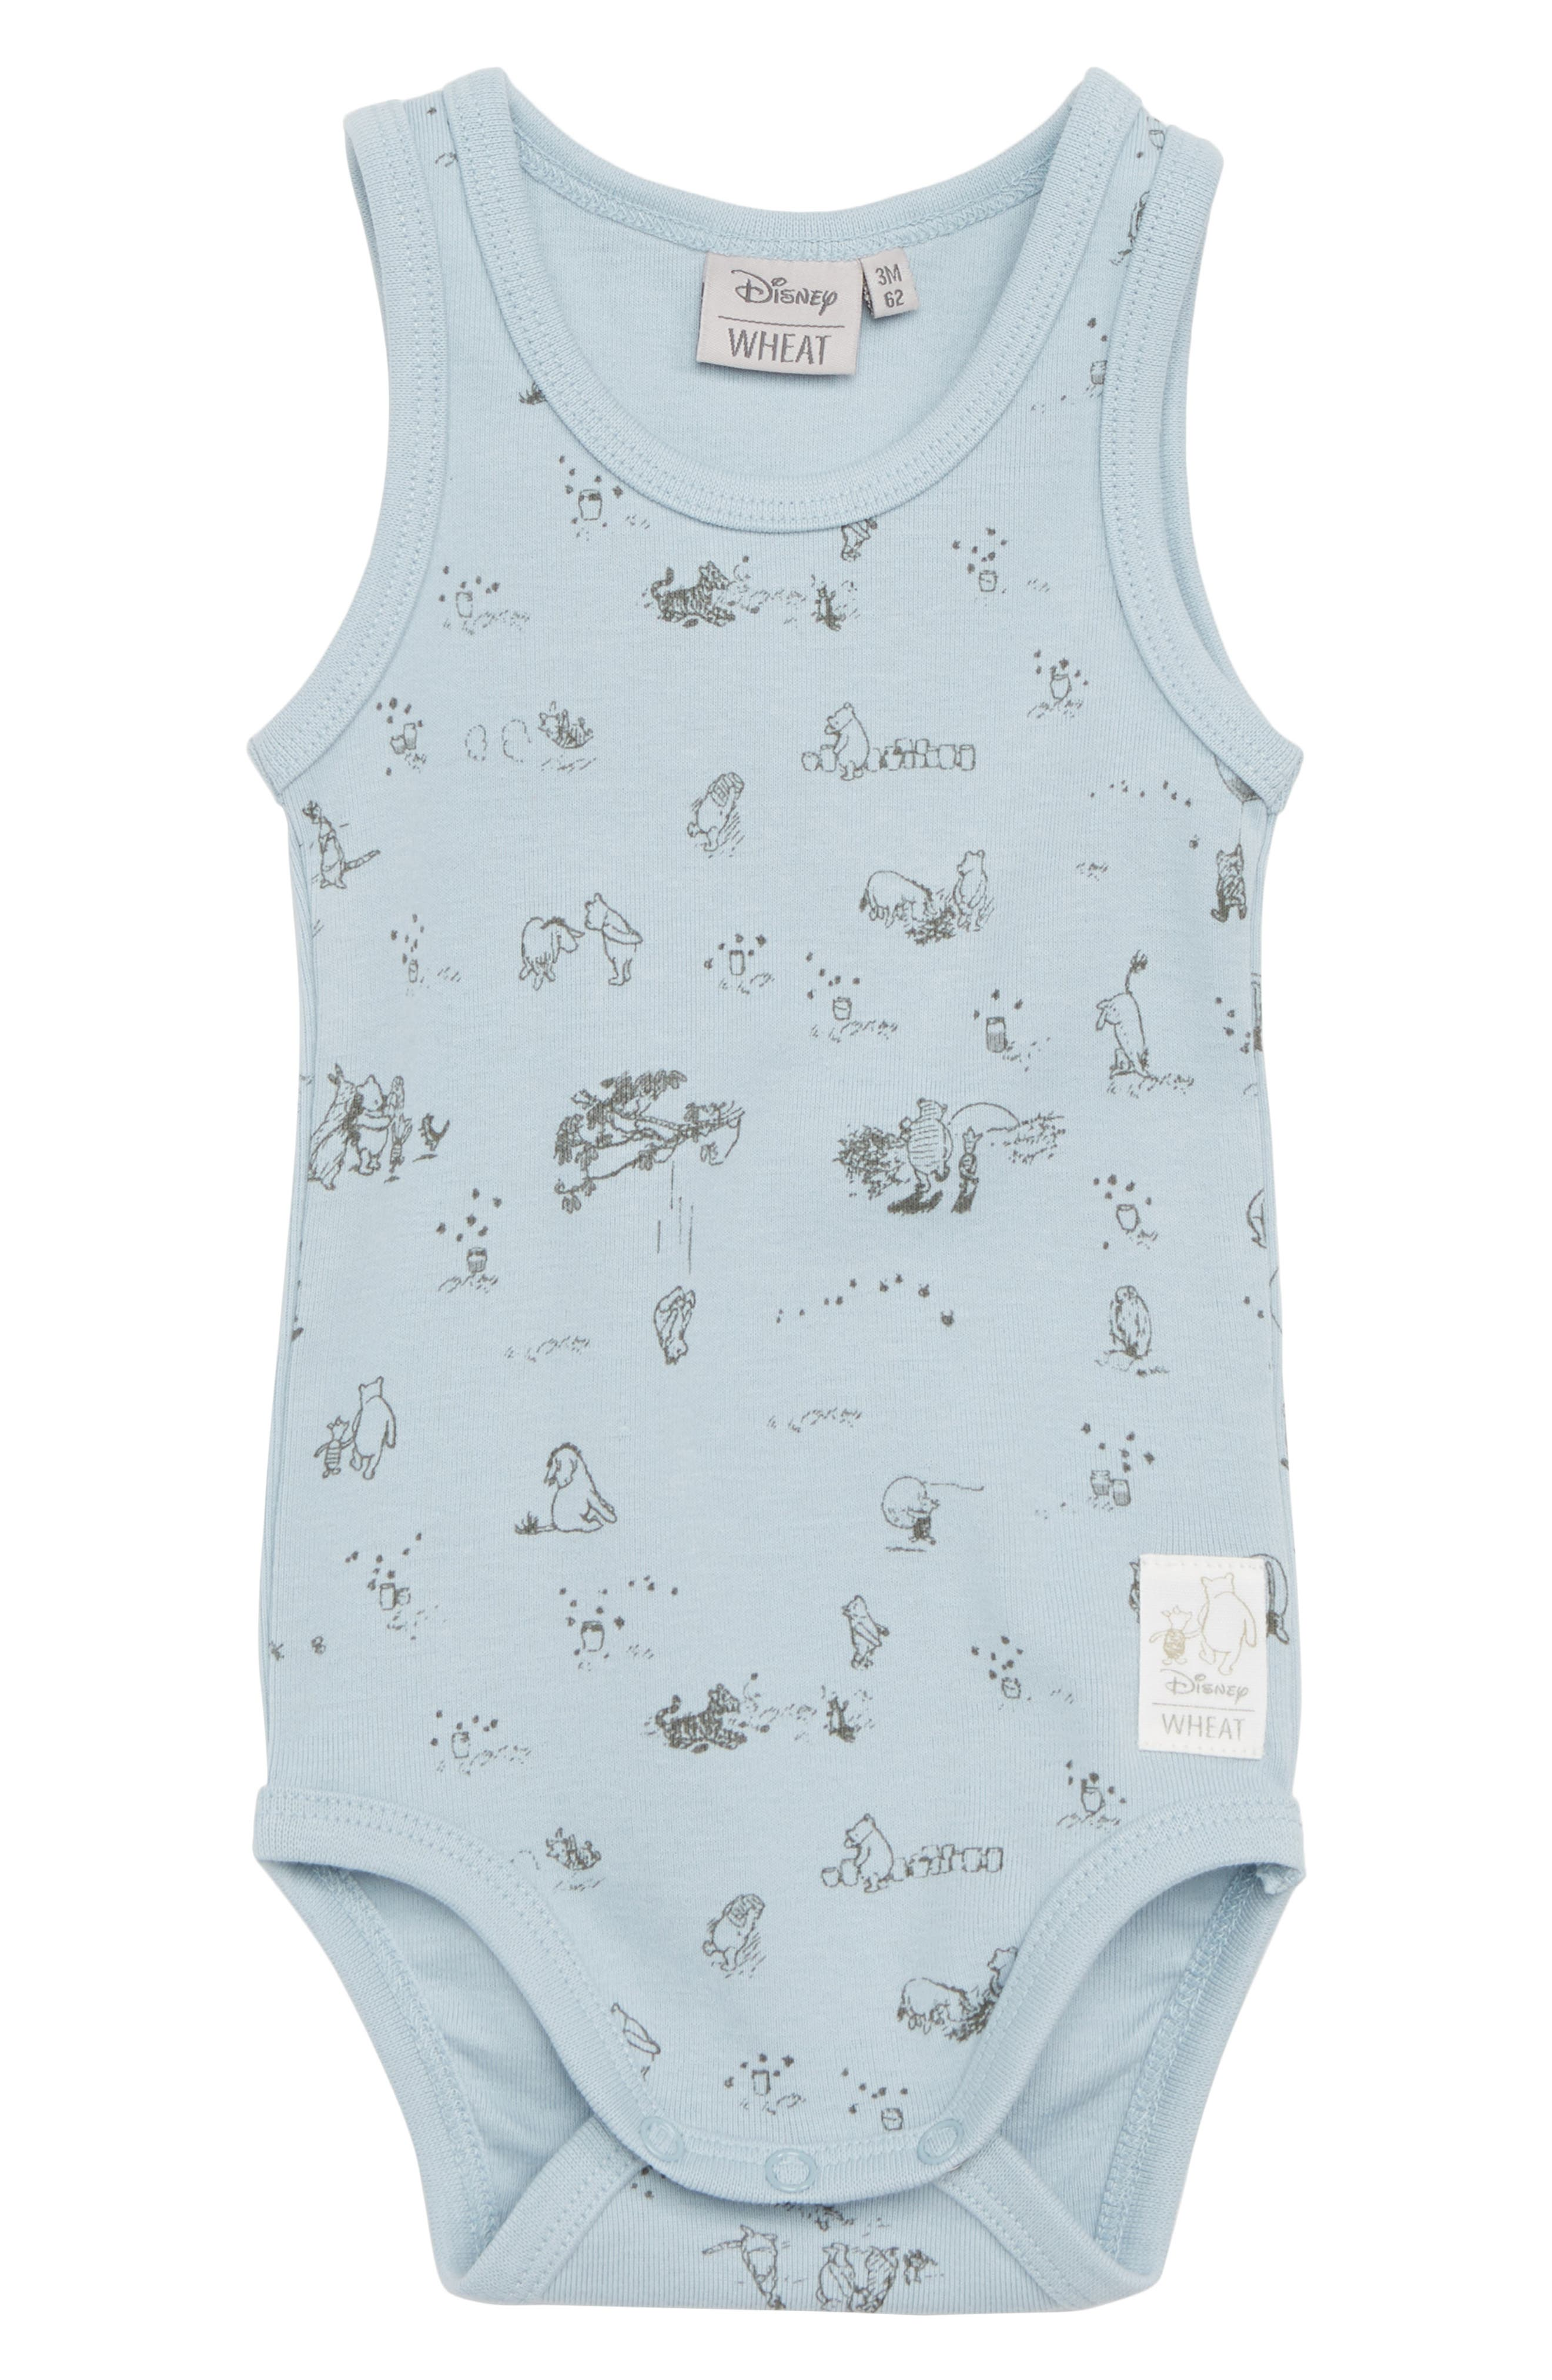 x Disney<sup>®</sup> Winnie the Pooh Organic Cotton Bodysuit,                             Main thumbnail 1, color,                             Sky